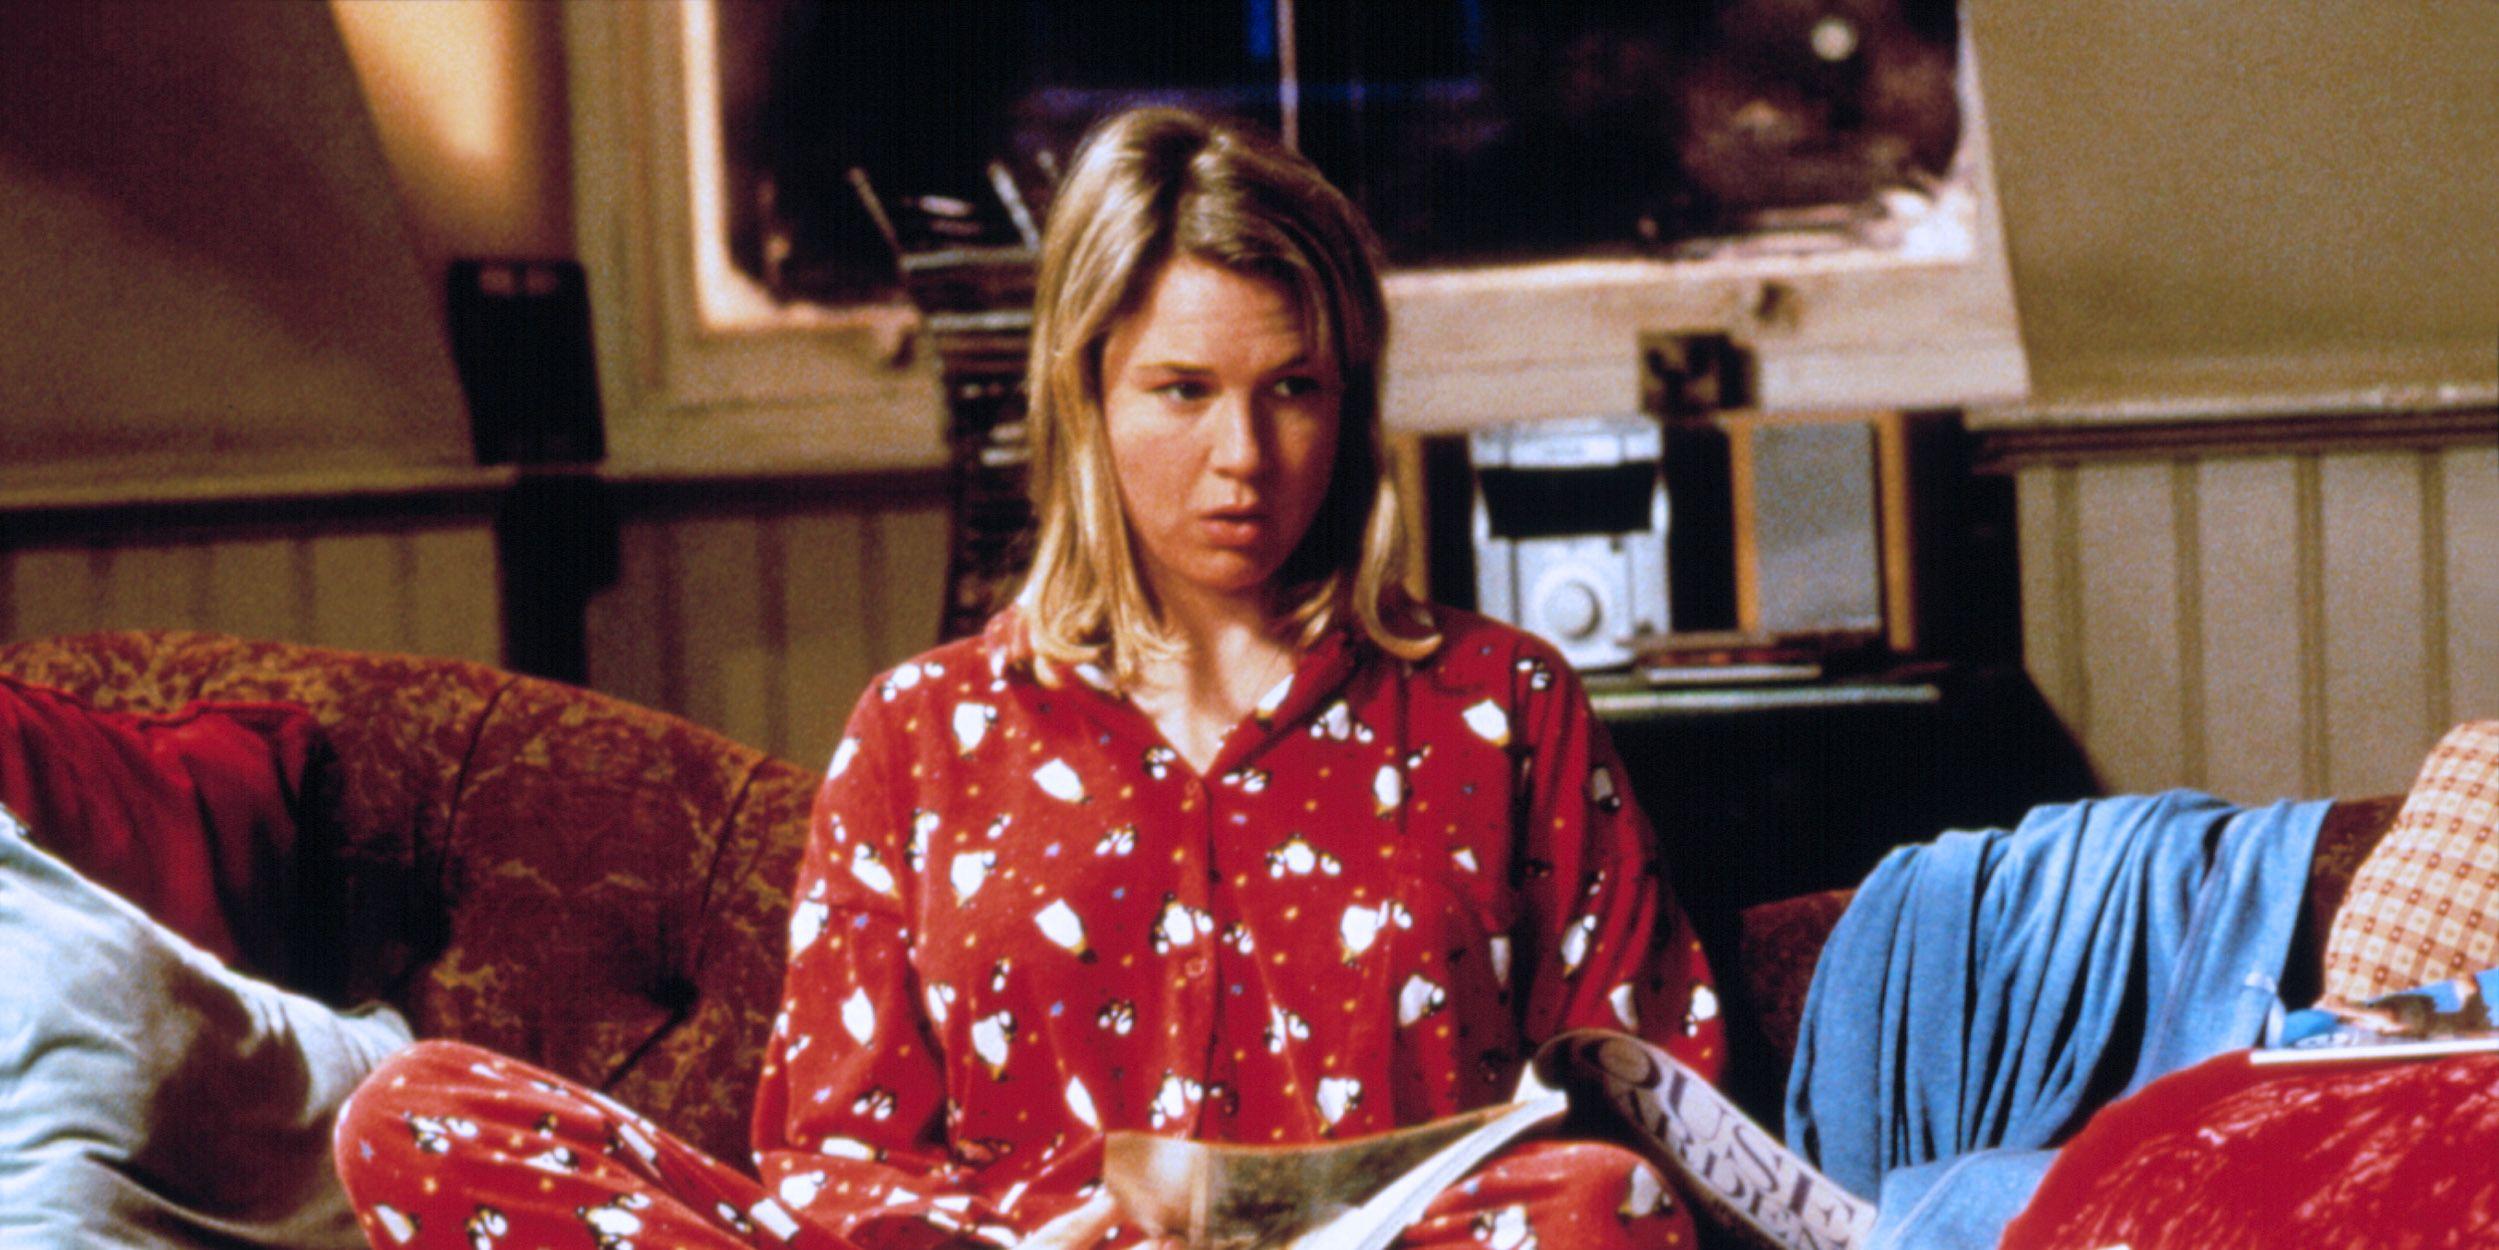 BRIDGET JONES'S DIARY, Renee Zellweger, 2001. (c) Universal Pictures/ Courtesy: Everett Collection.